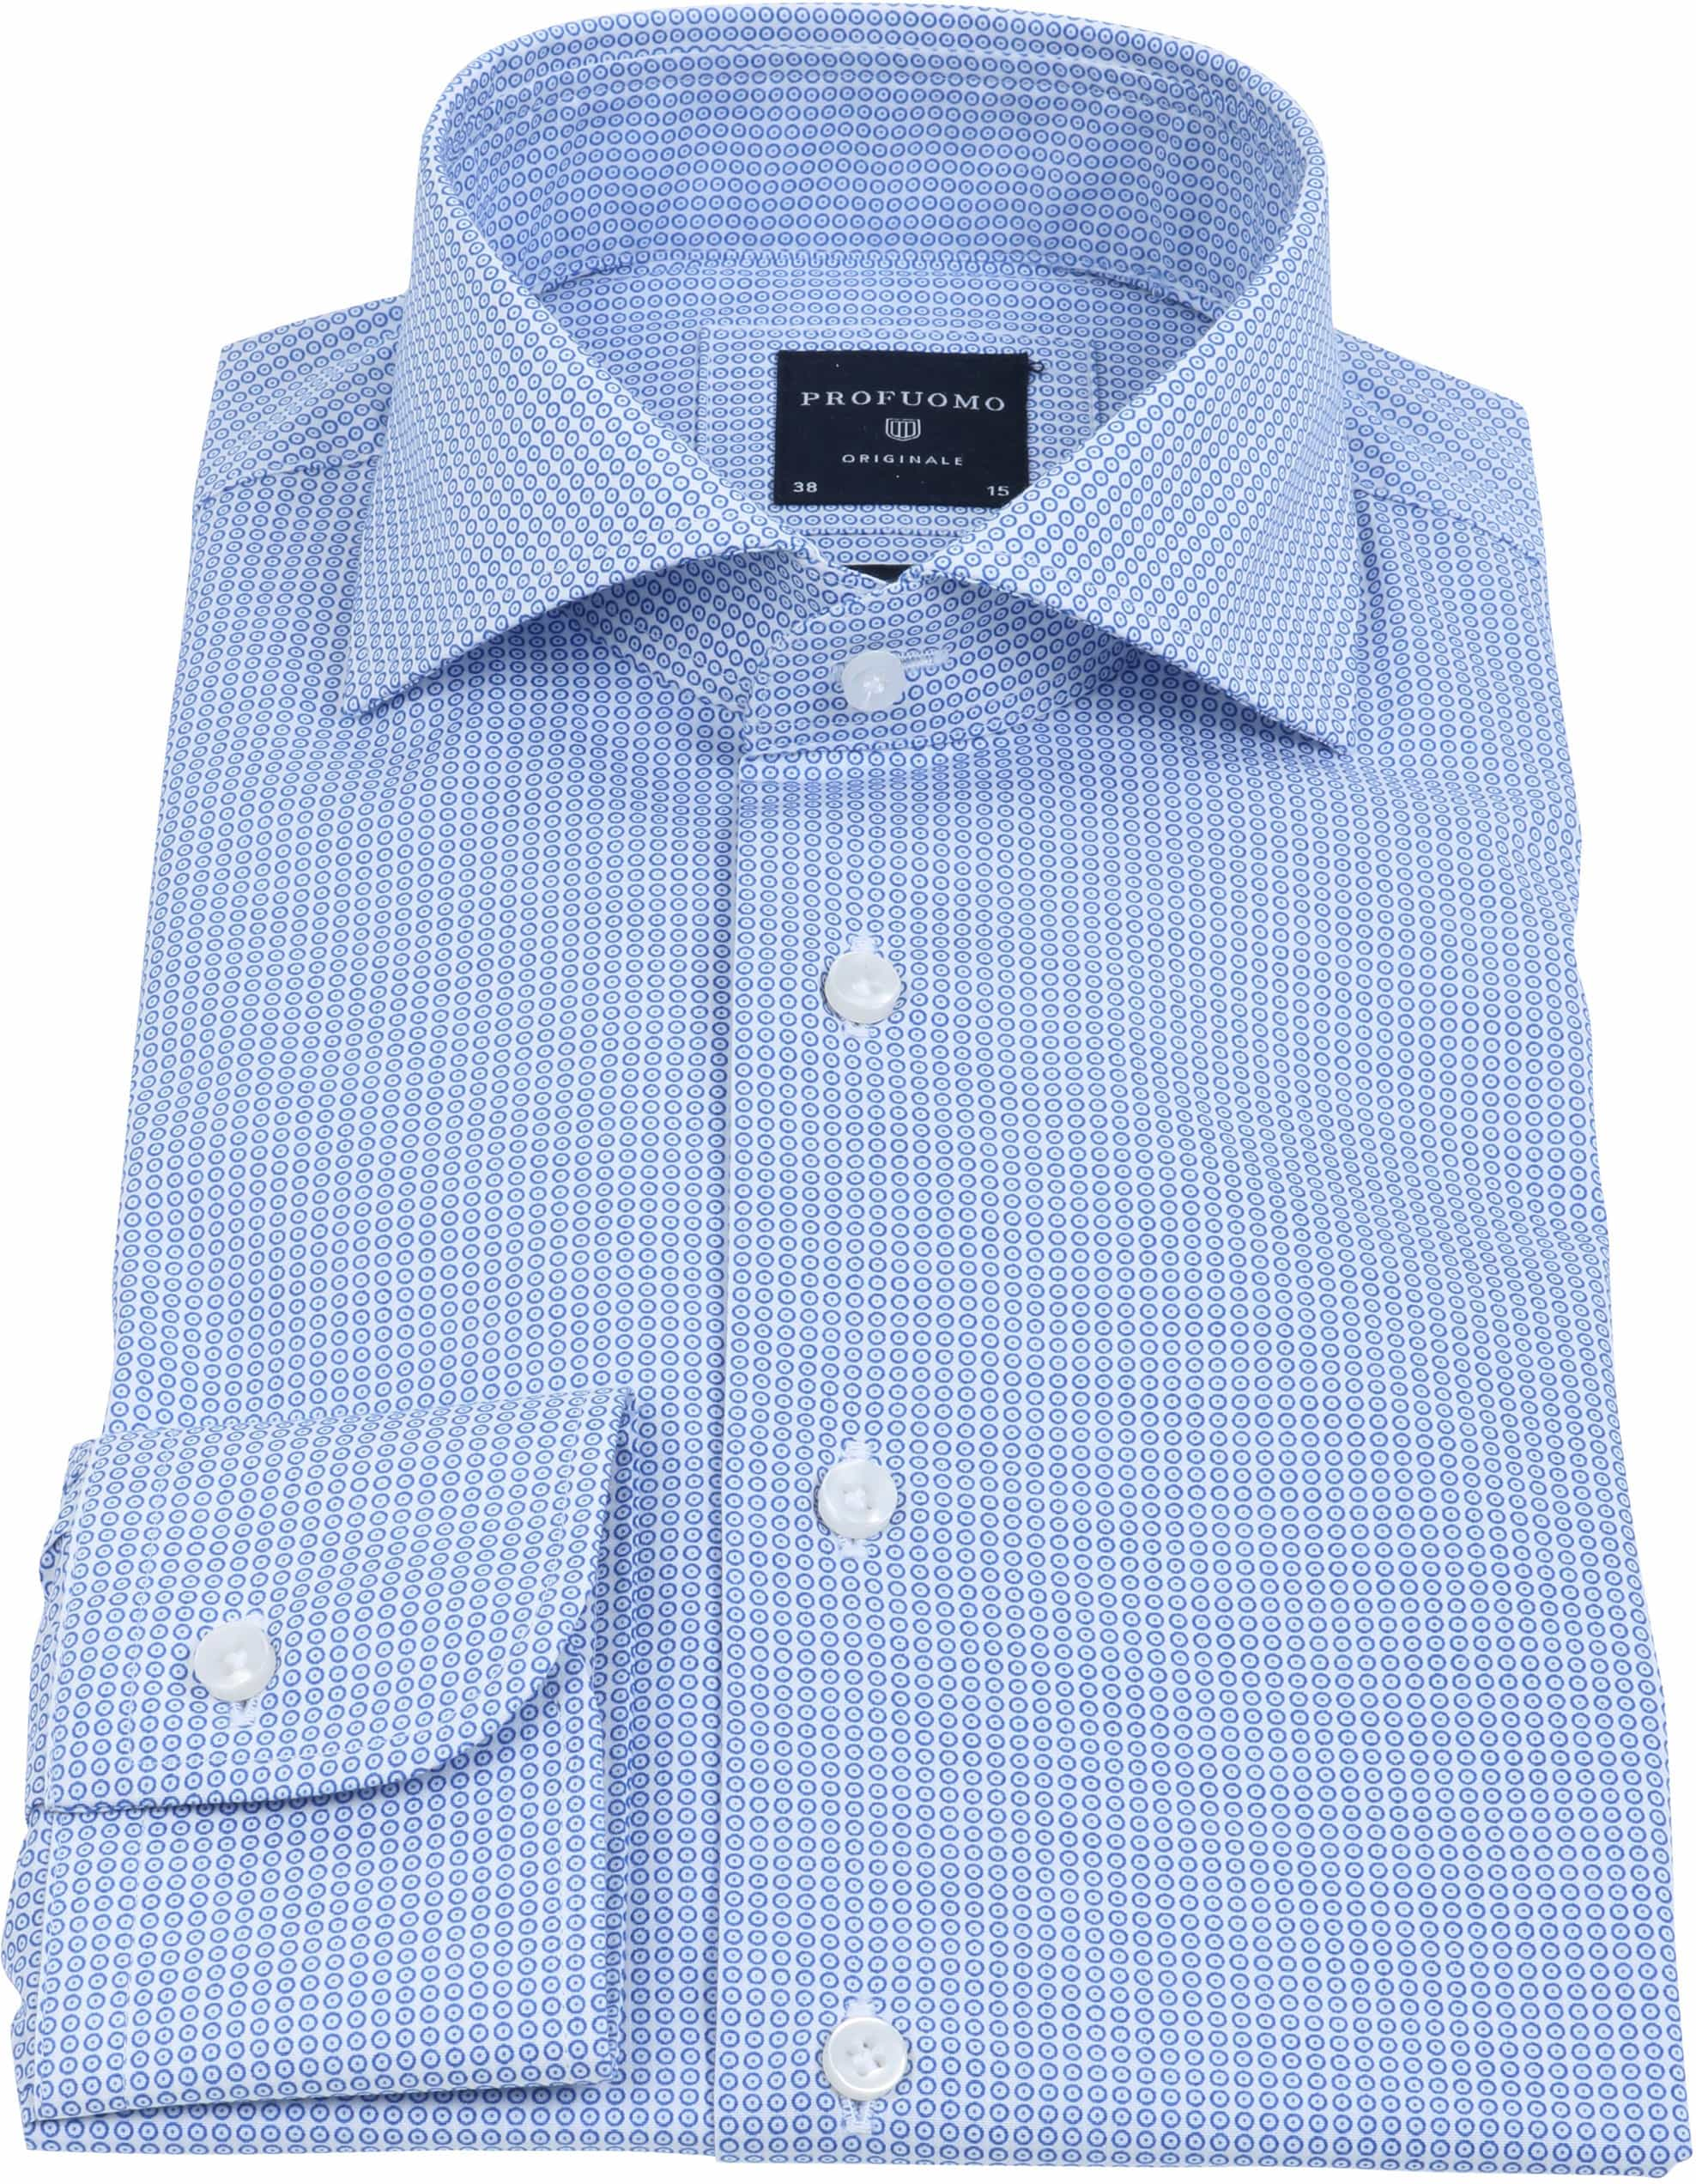 Profuomo Overhemd Dessin Blauw foto 1